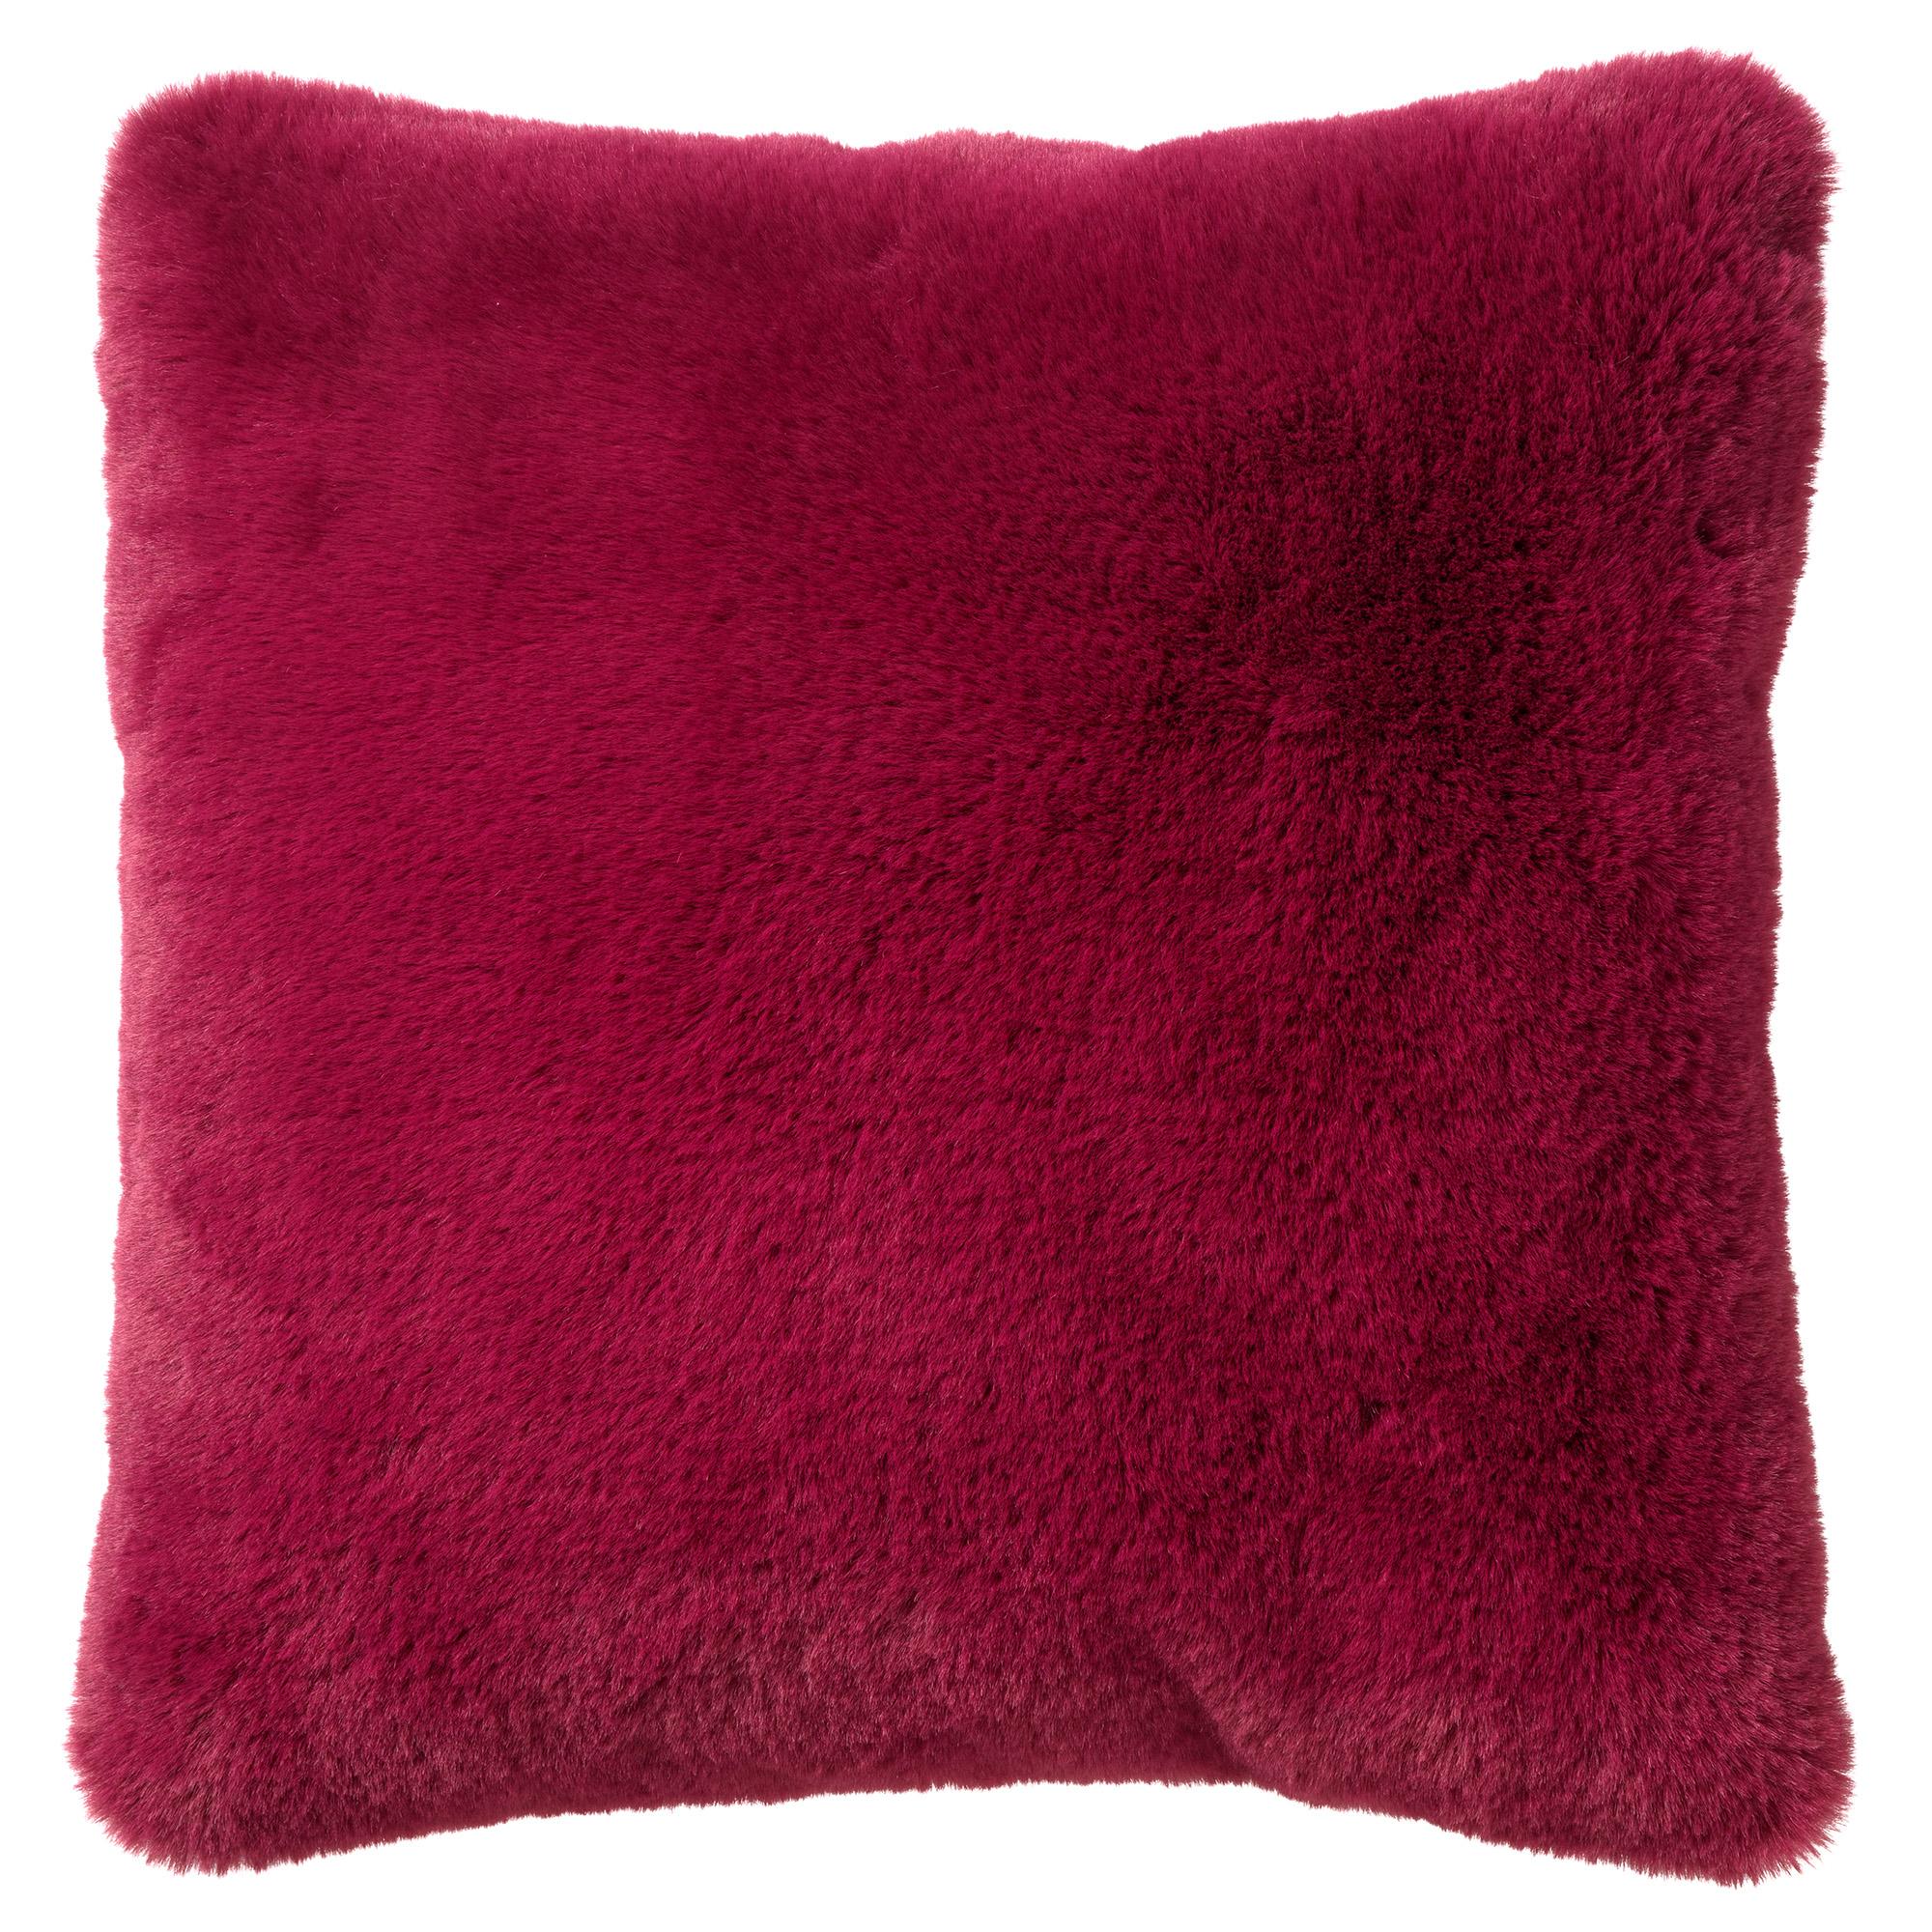 Coussin imitation fourrure Prune rouge 45x45